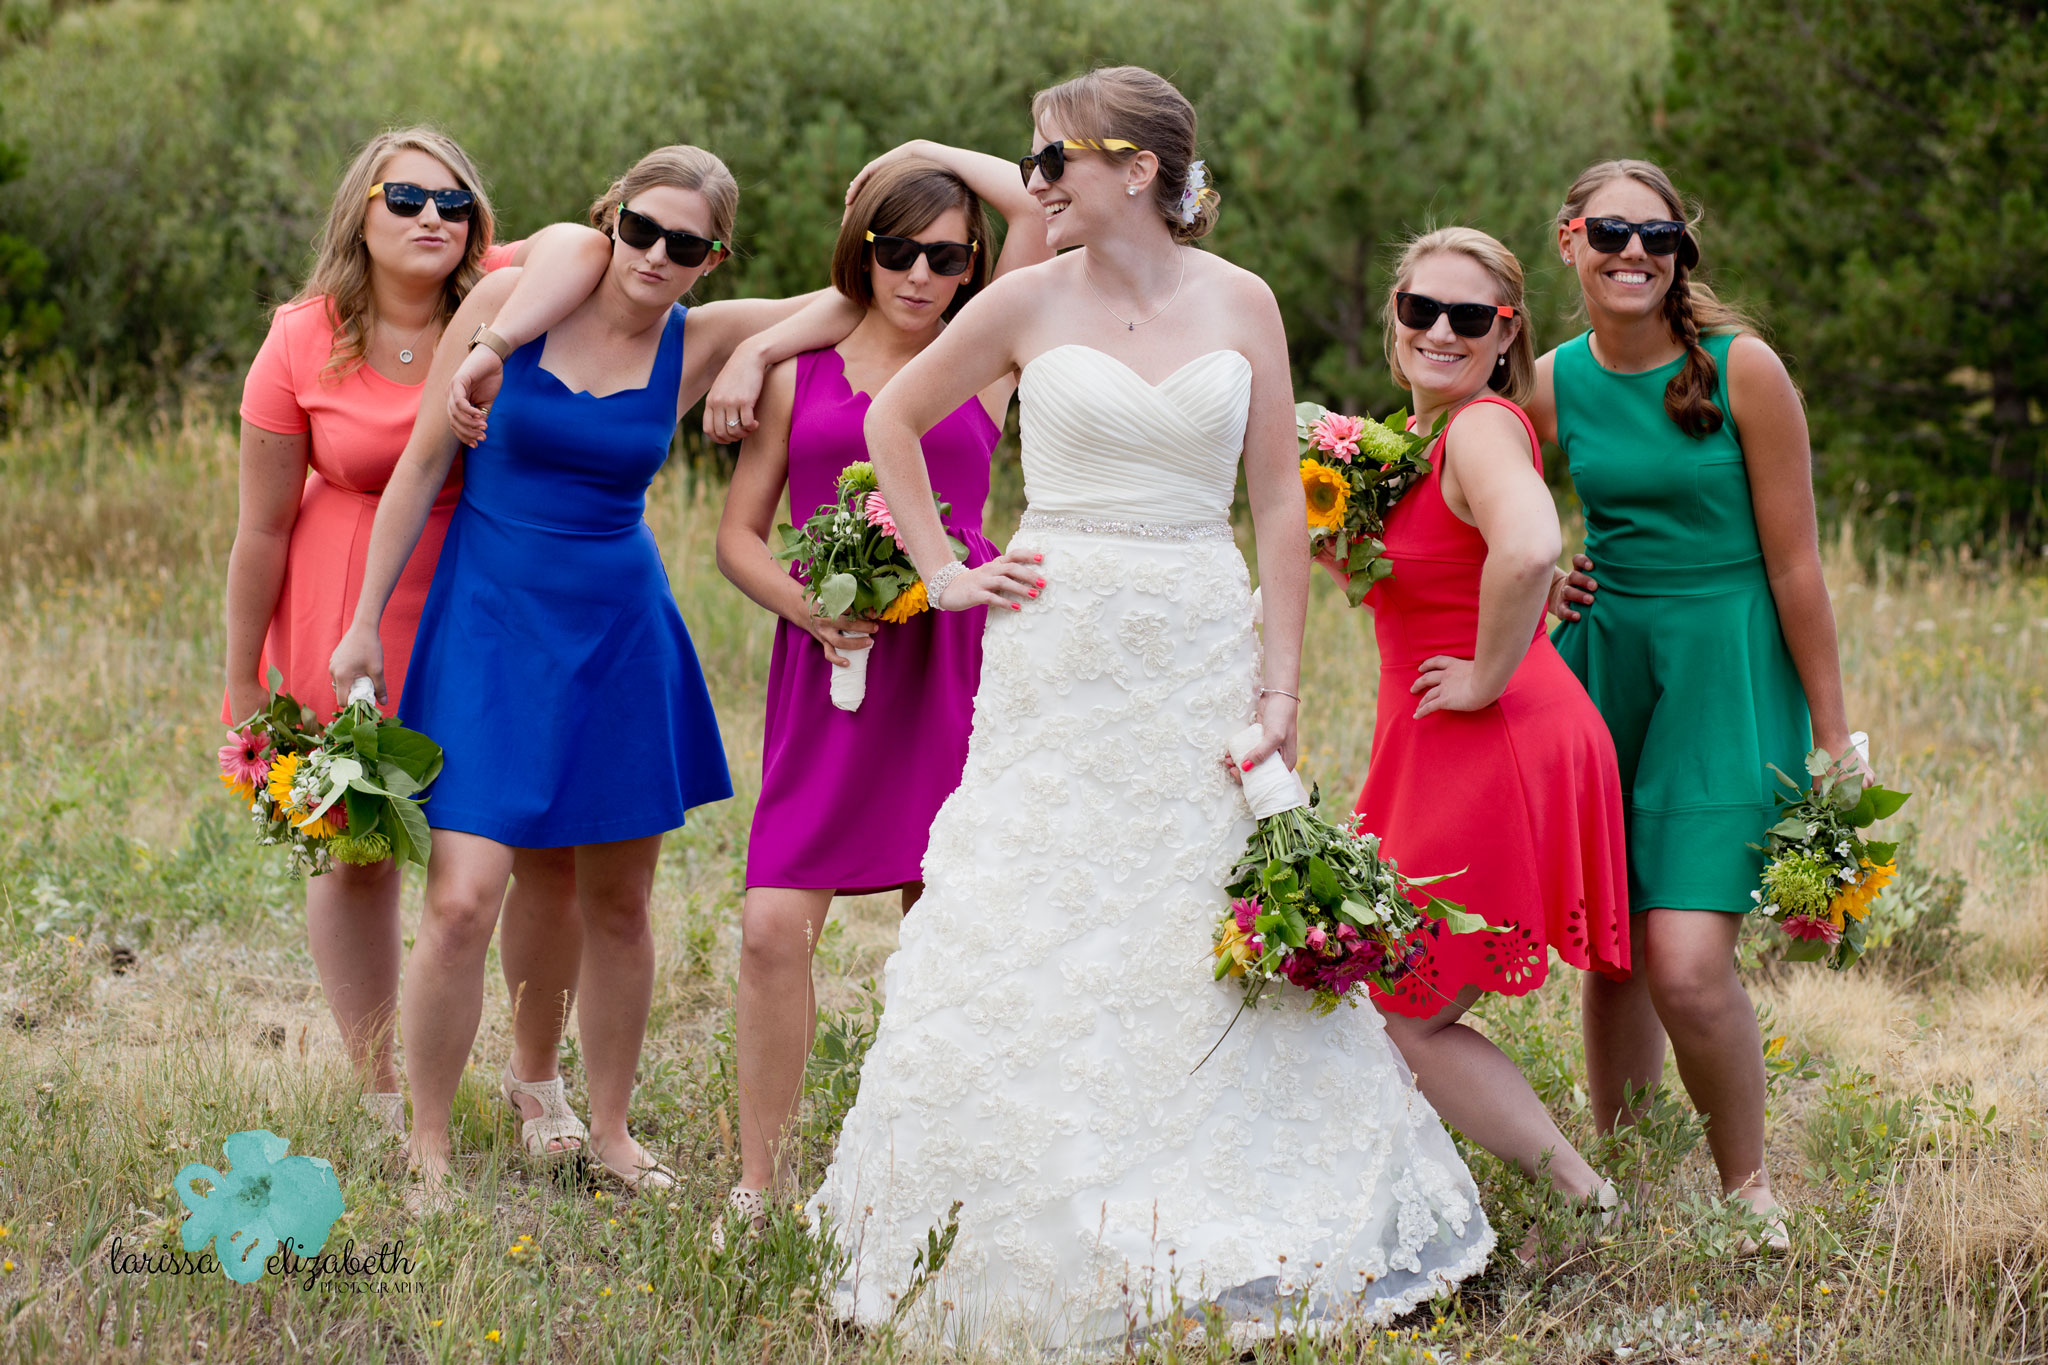 Sassy-bridesmaids